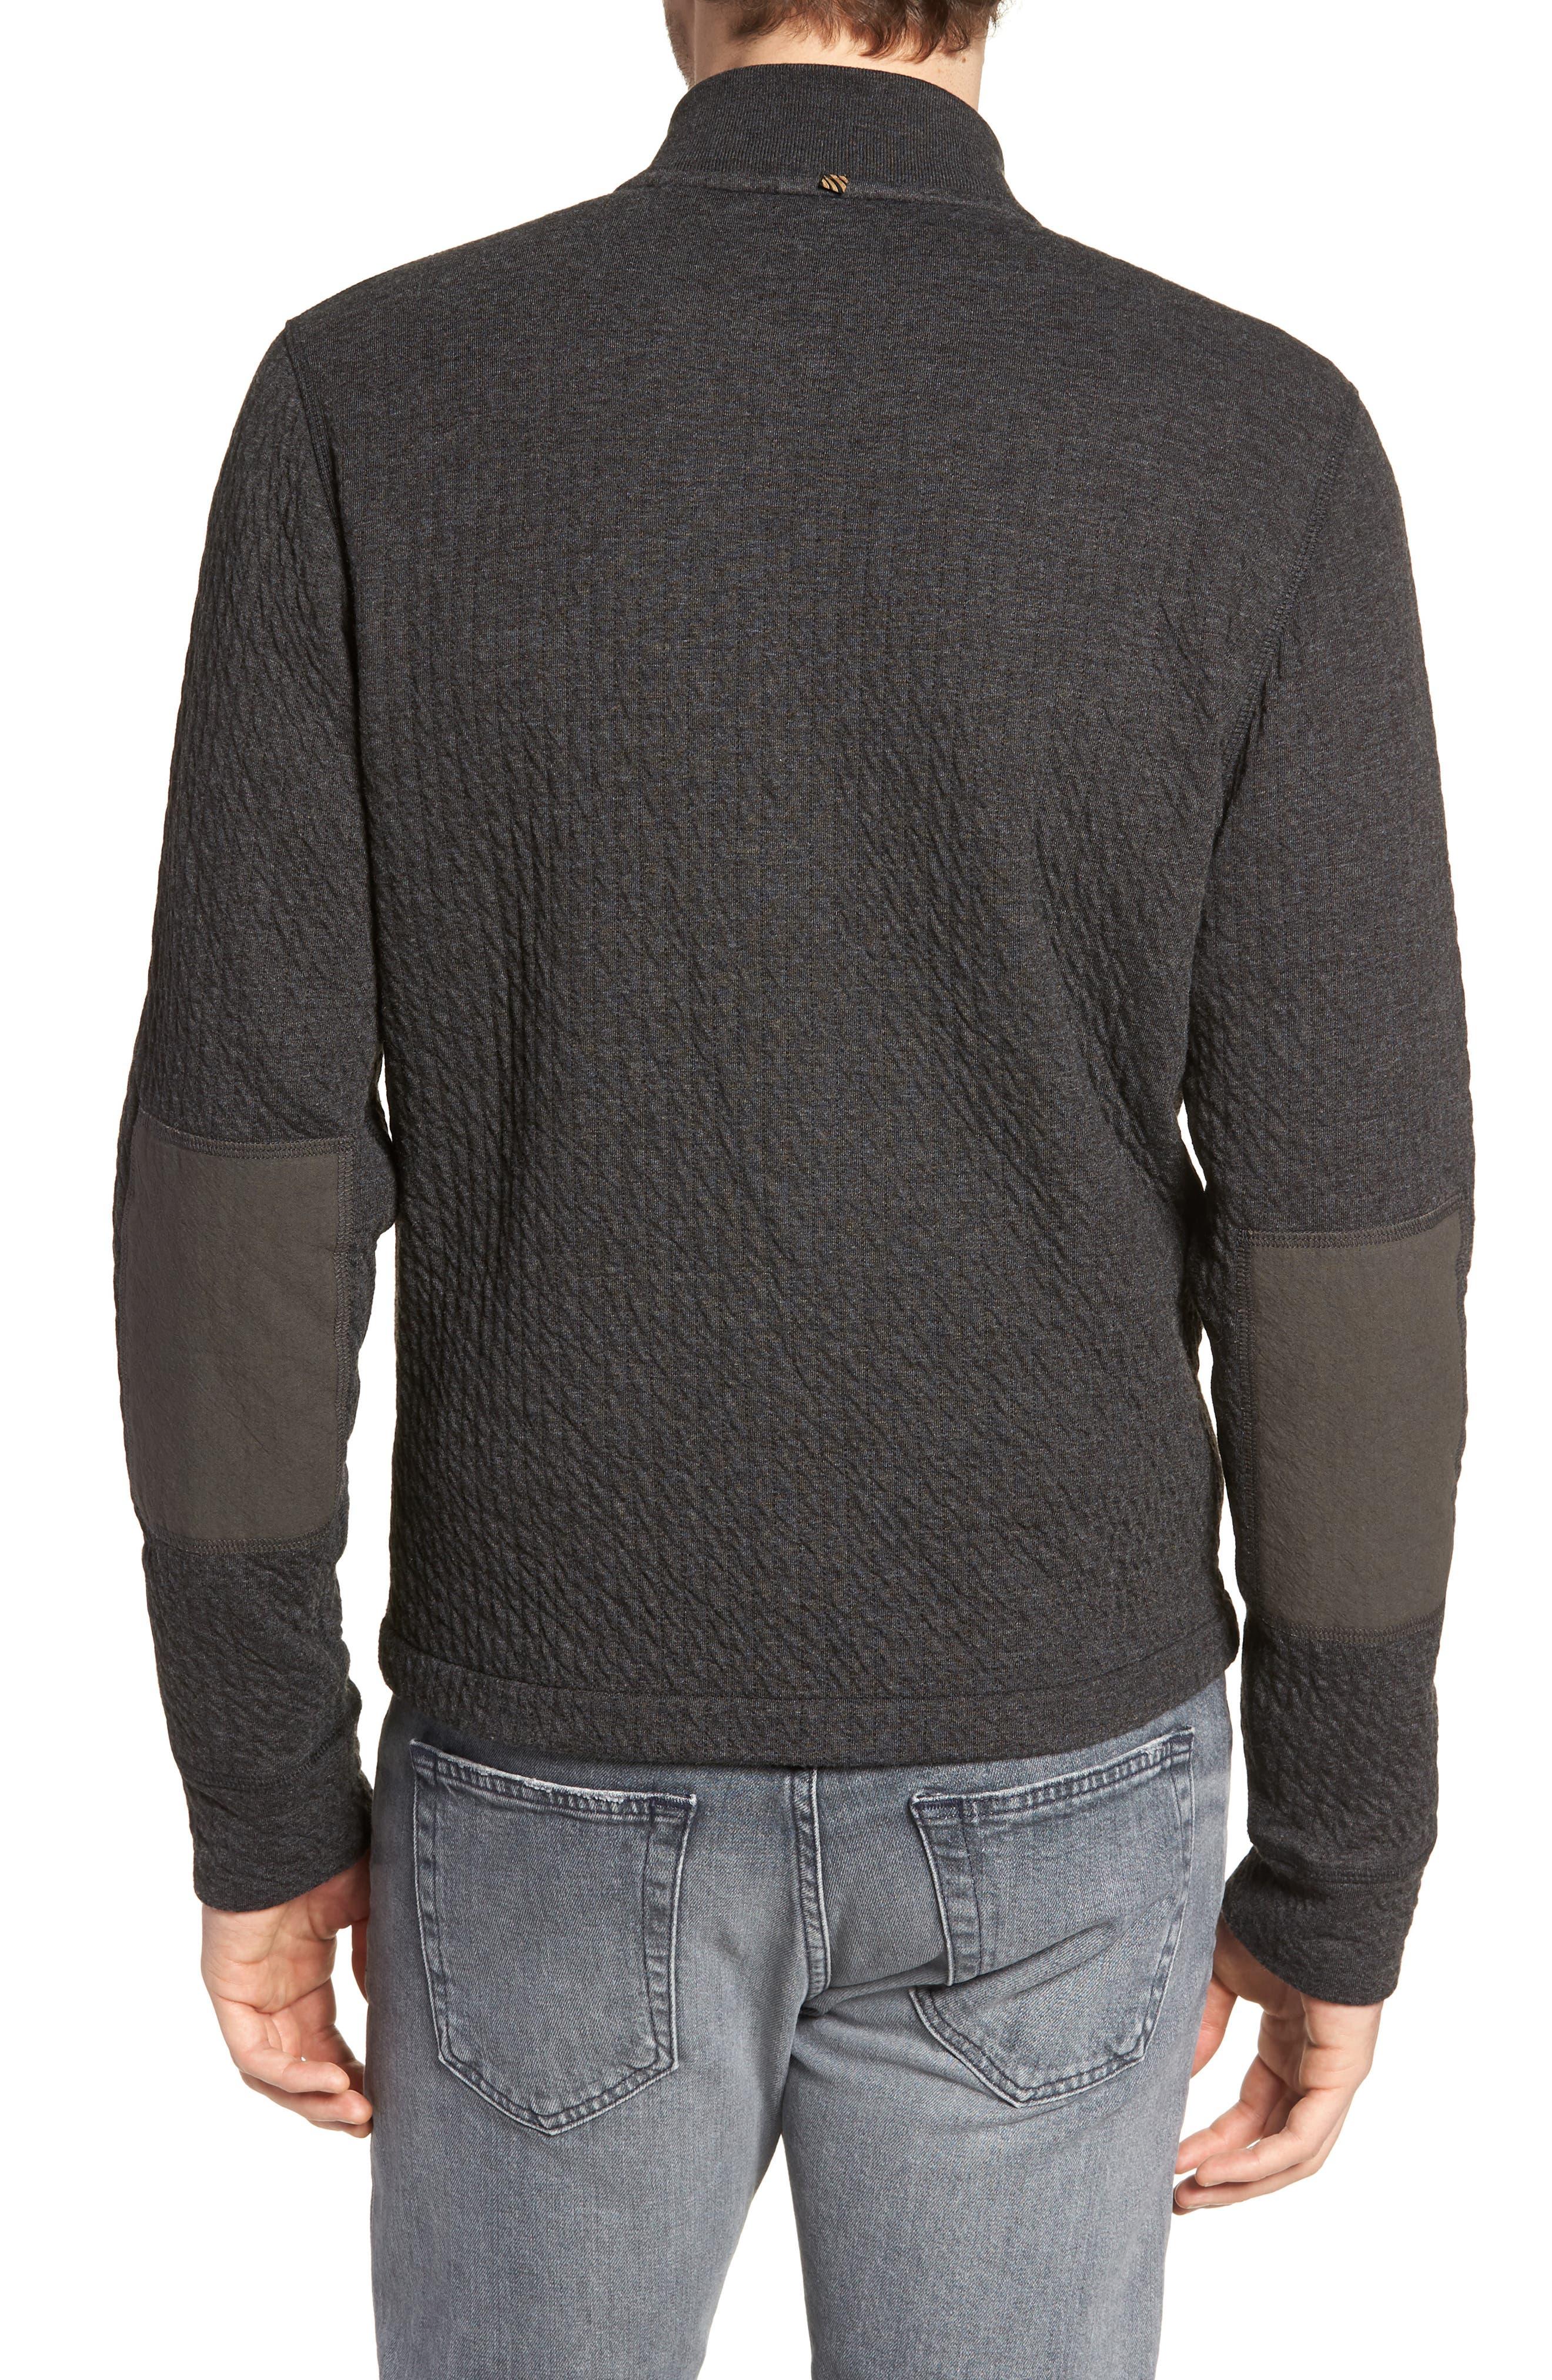 Giles Slim Fit Zip-Up Sweatshirt,                             Alternate thumbnail 2, color,                             402